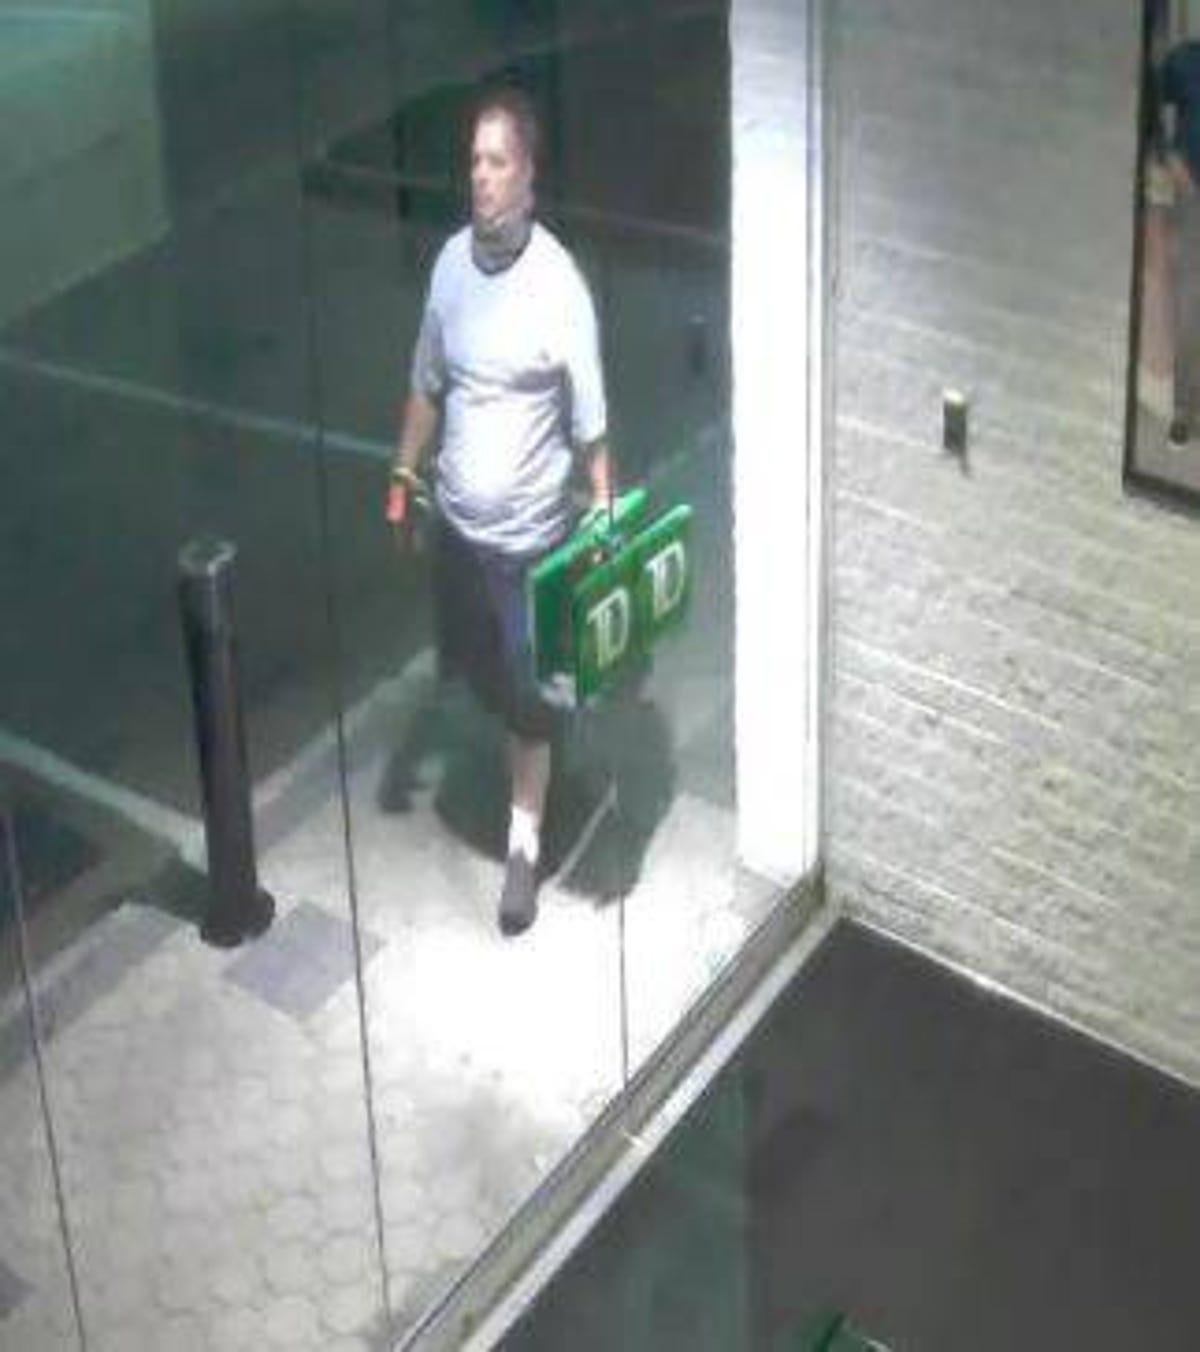 Suspect in series of TD Bank burglaries arrested